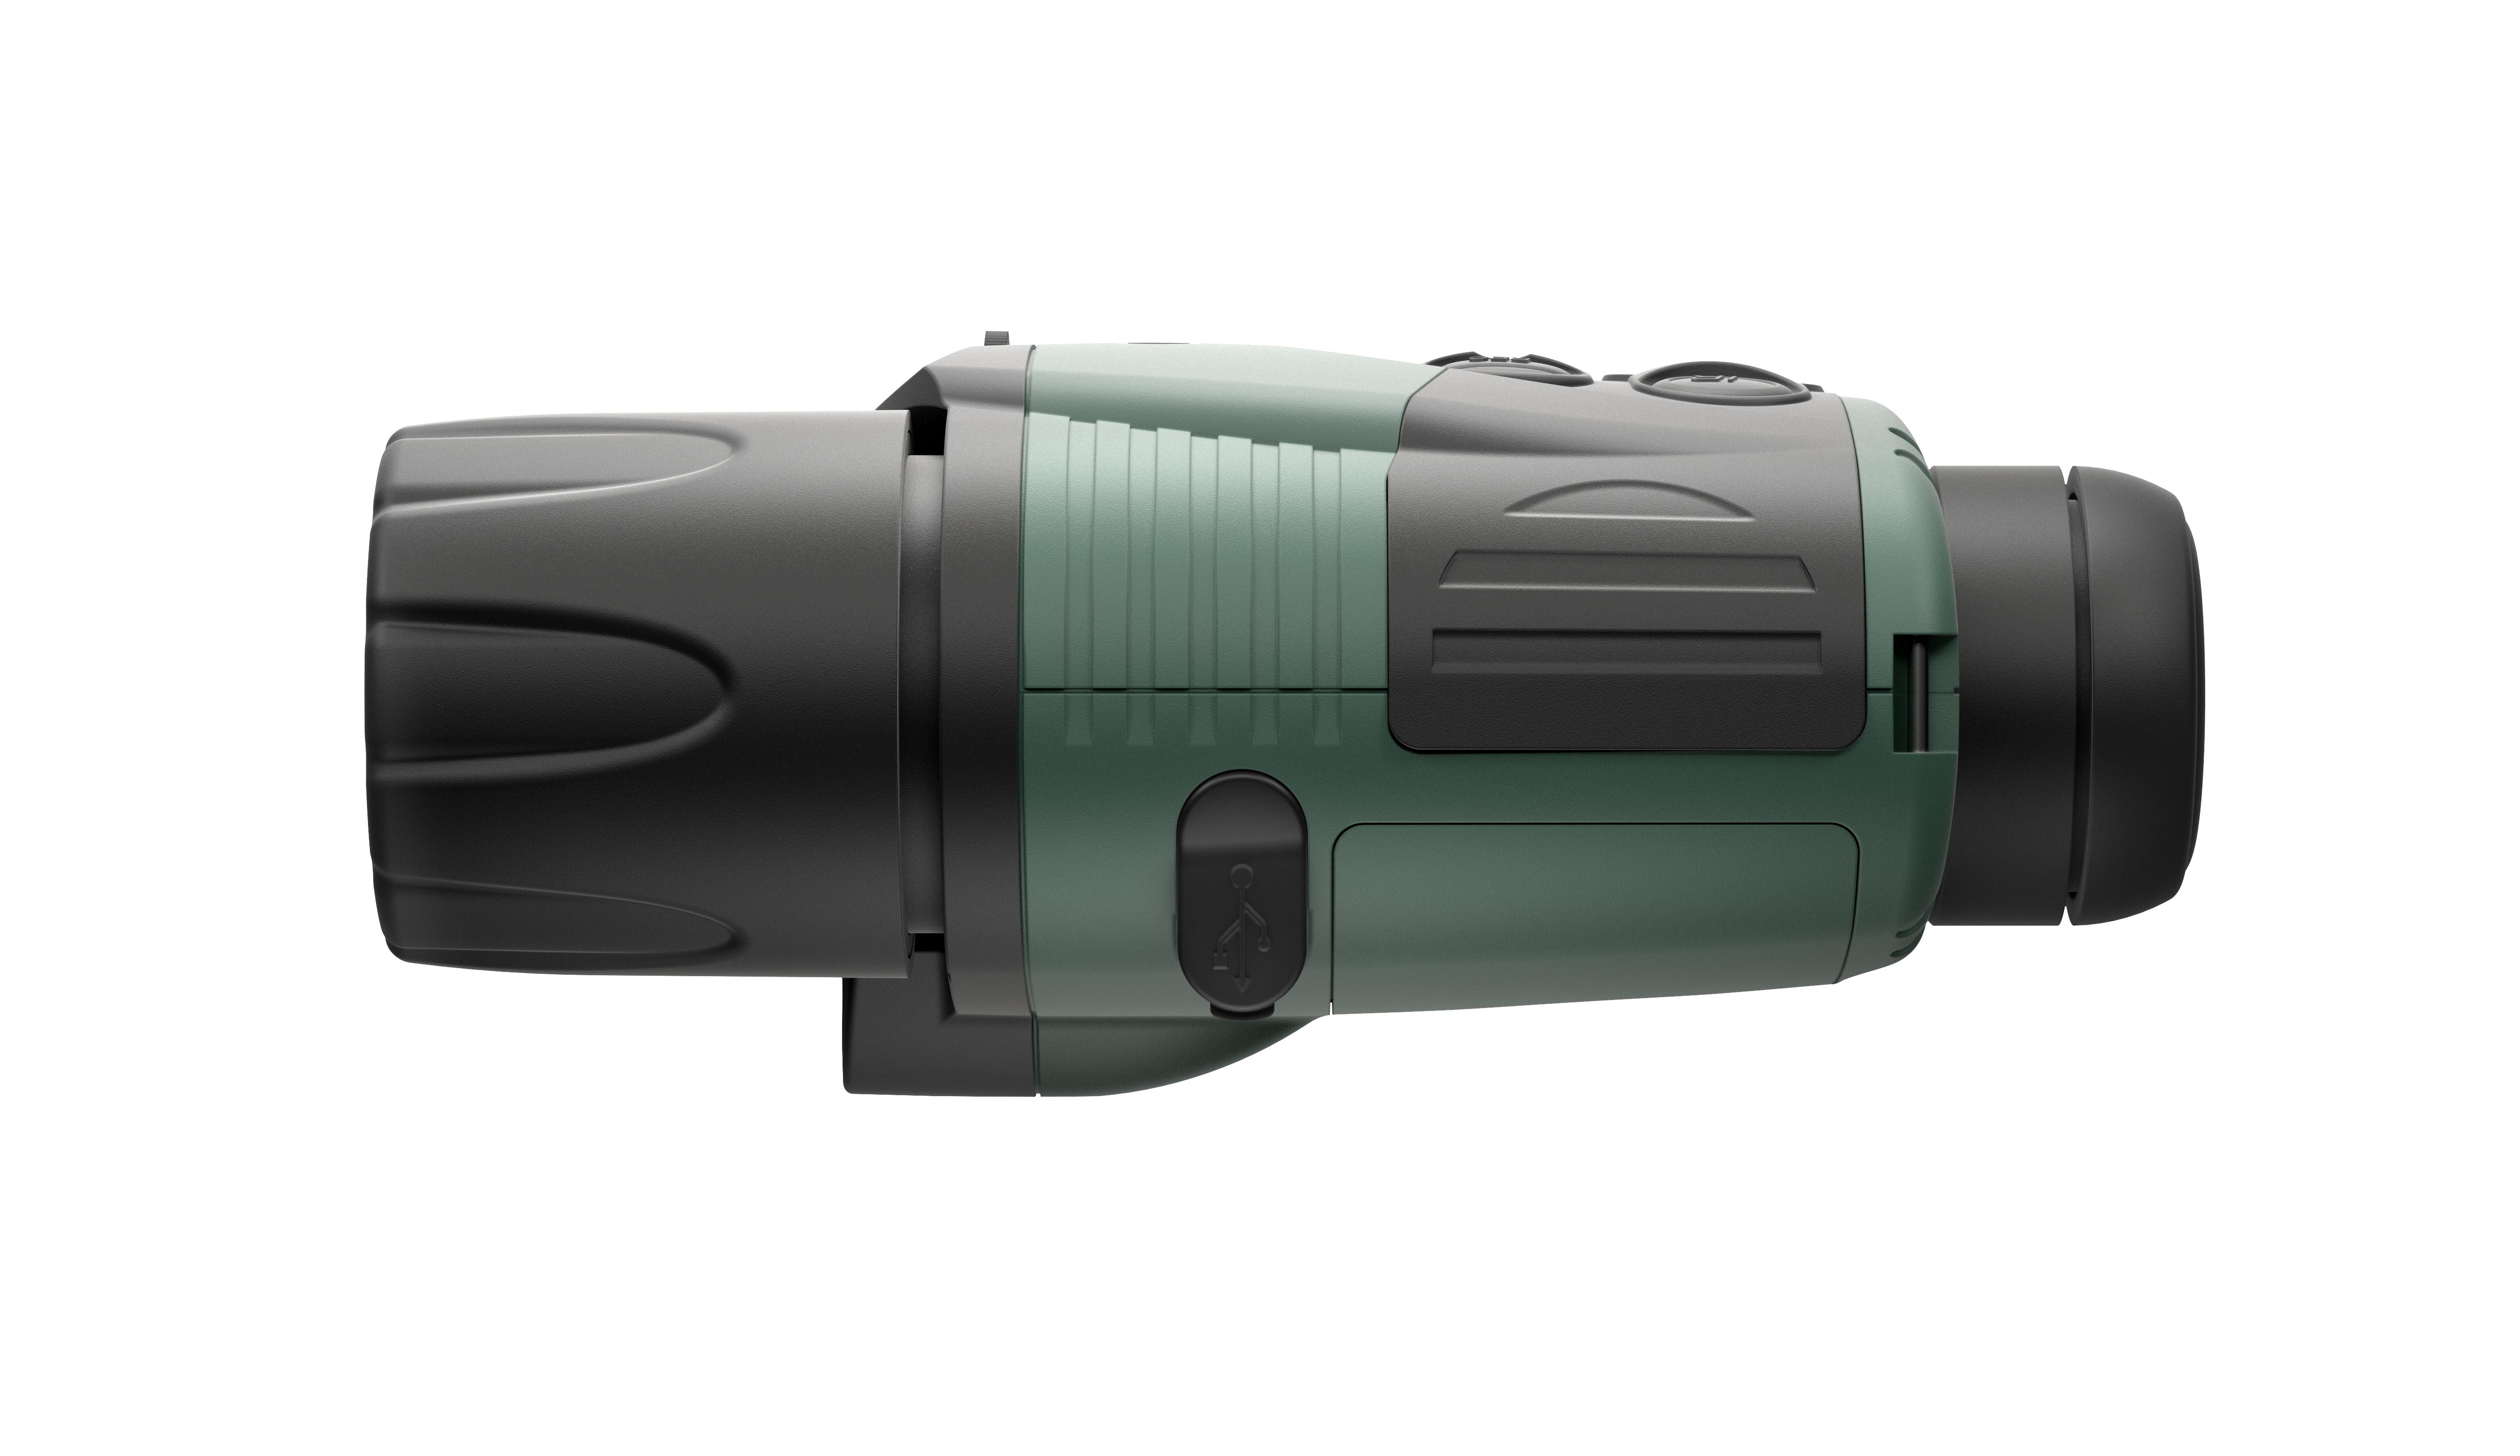 Yukon ranger rt 6.5x42 digitales nachtsichtgerät mono bresser